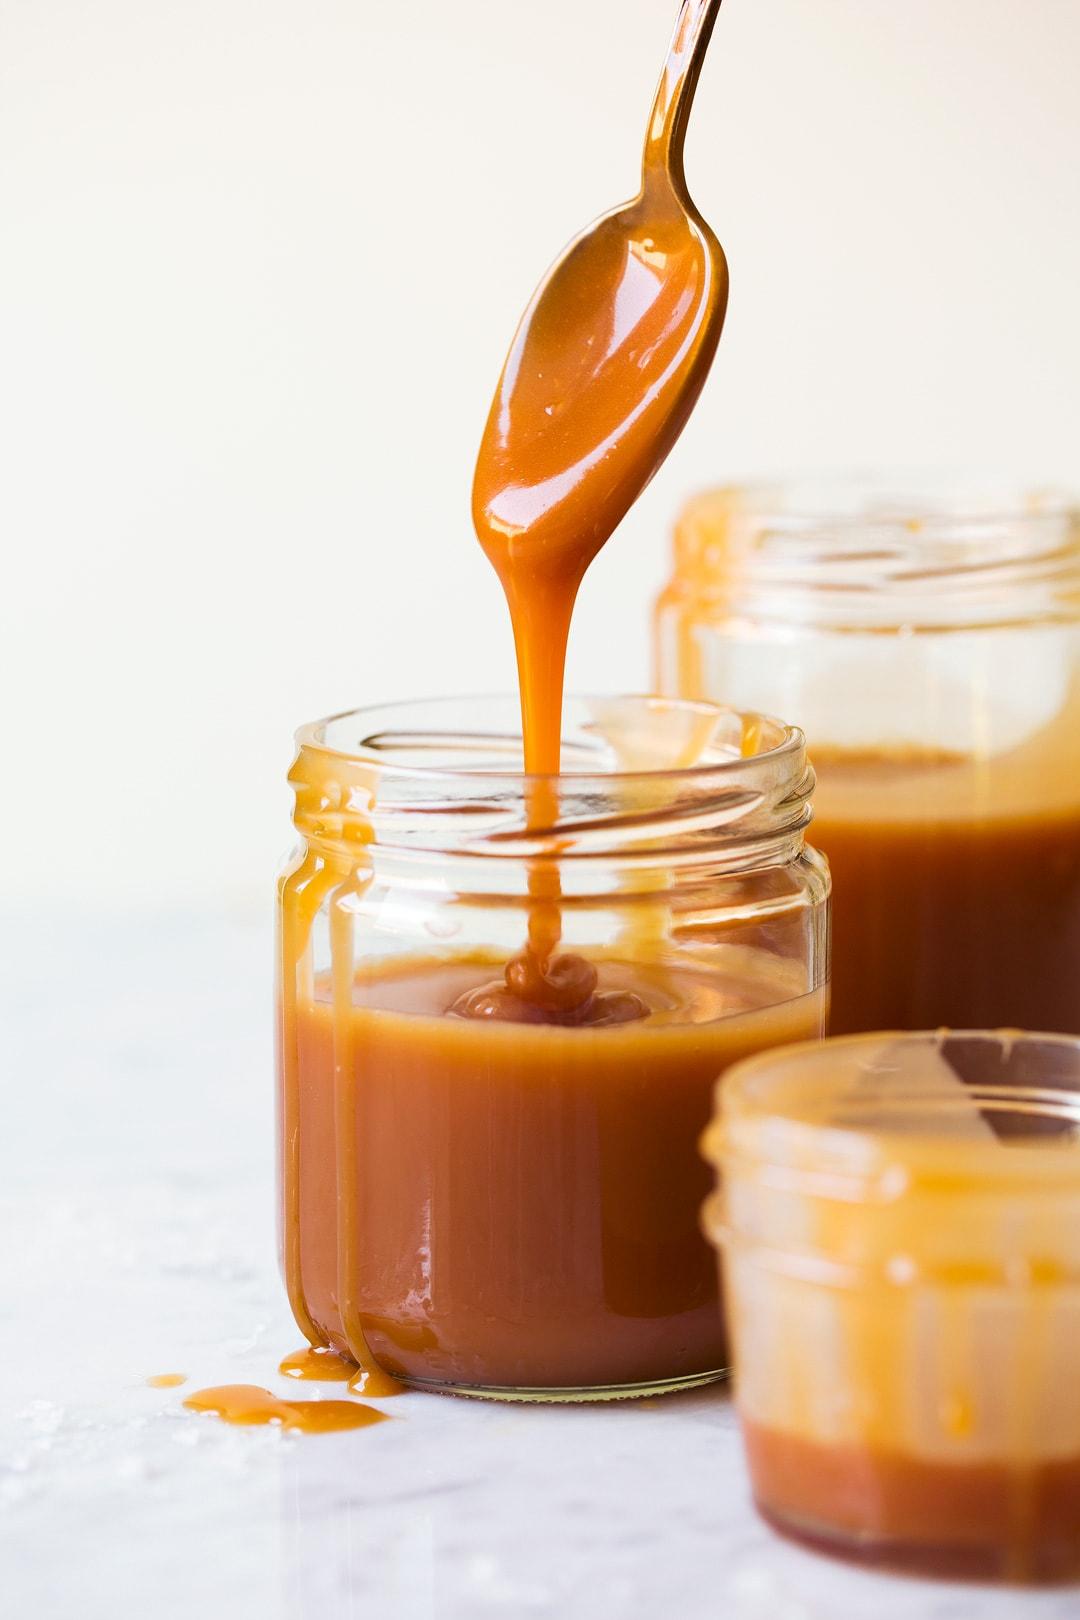 salted caramel sauce with